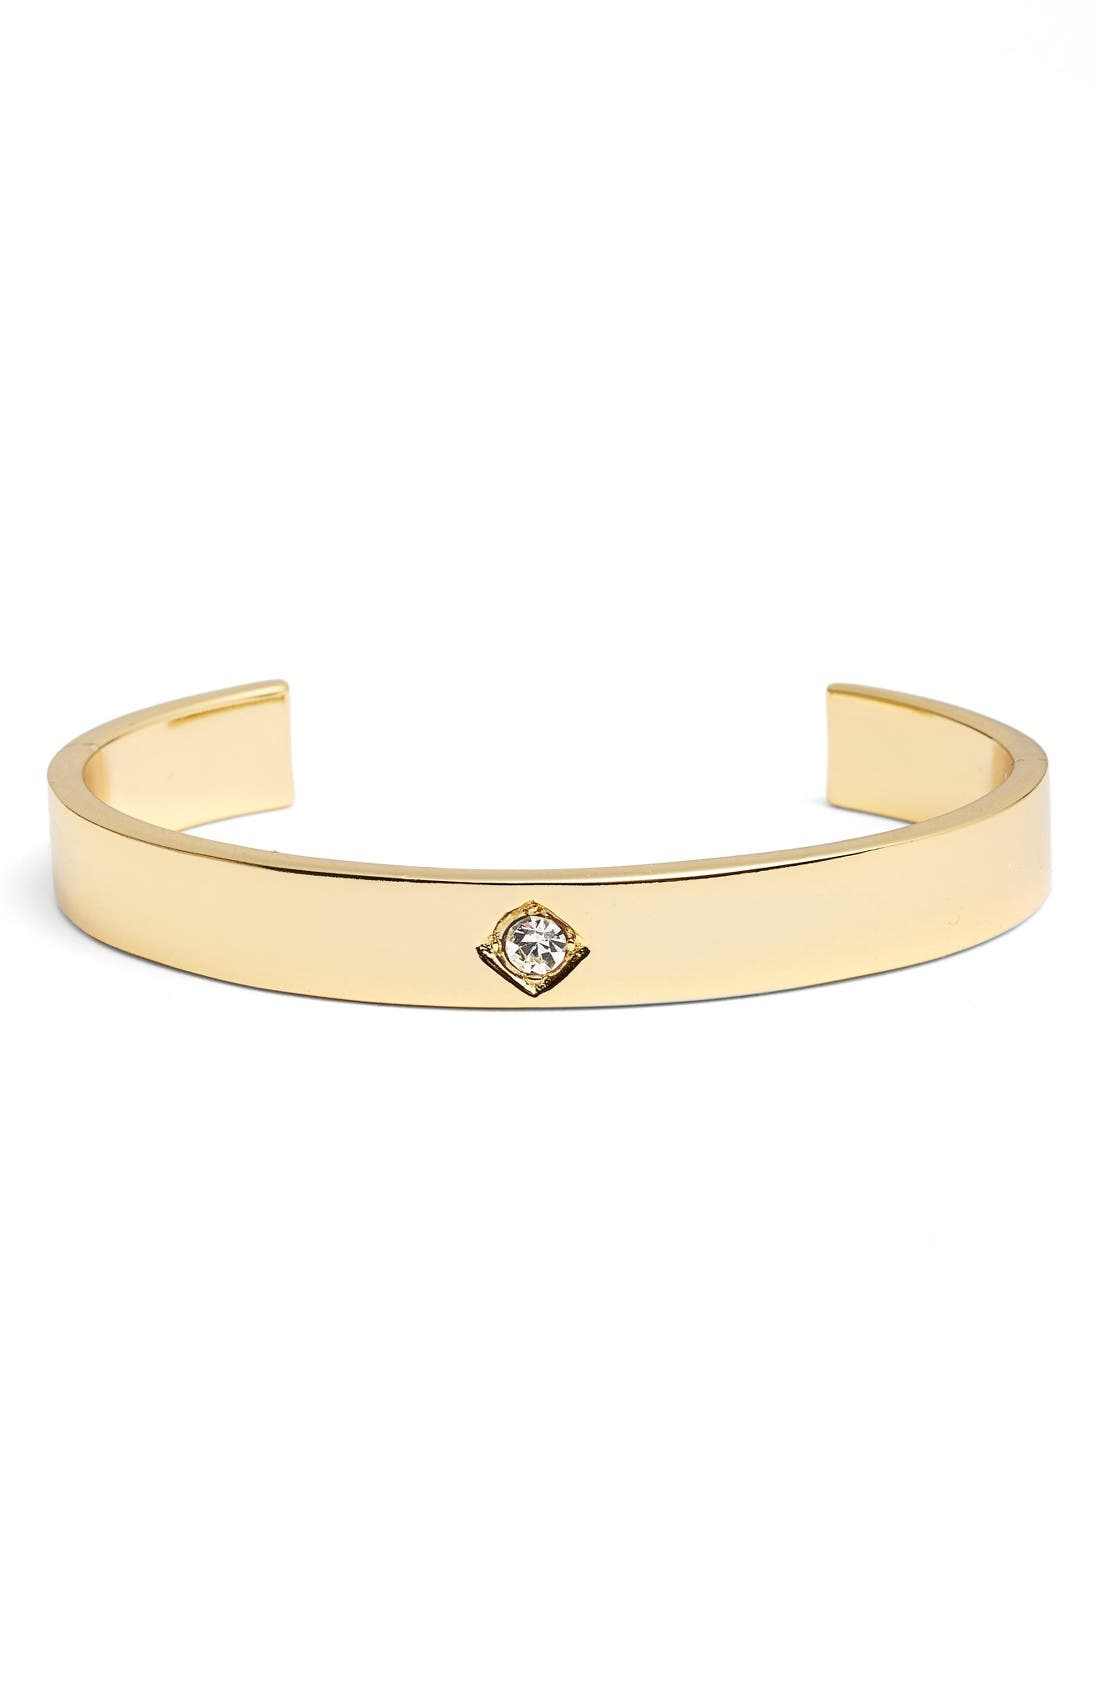 Alternate Image 1 Selected - Jules Smith Tulum Cuff Bracelet